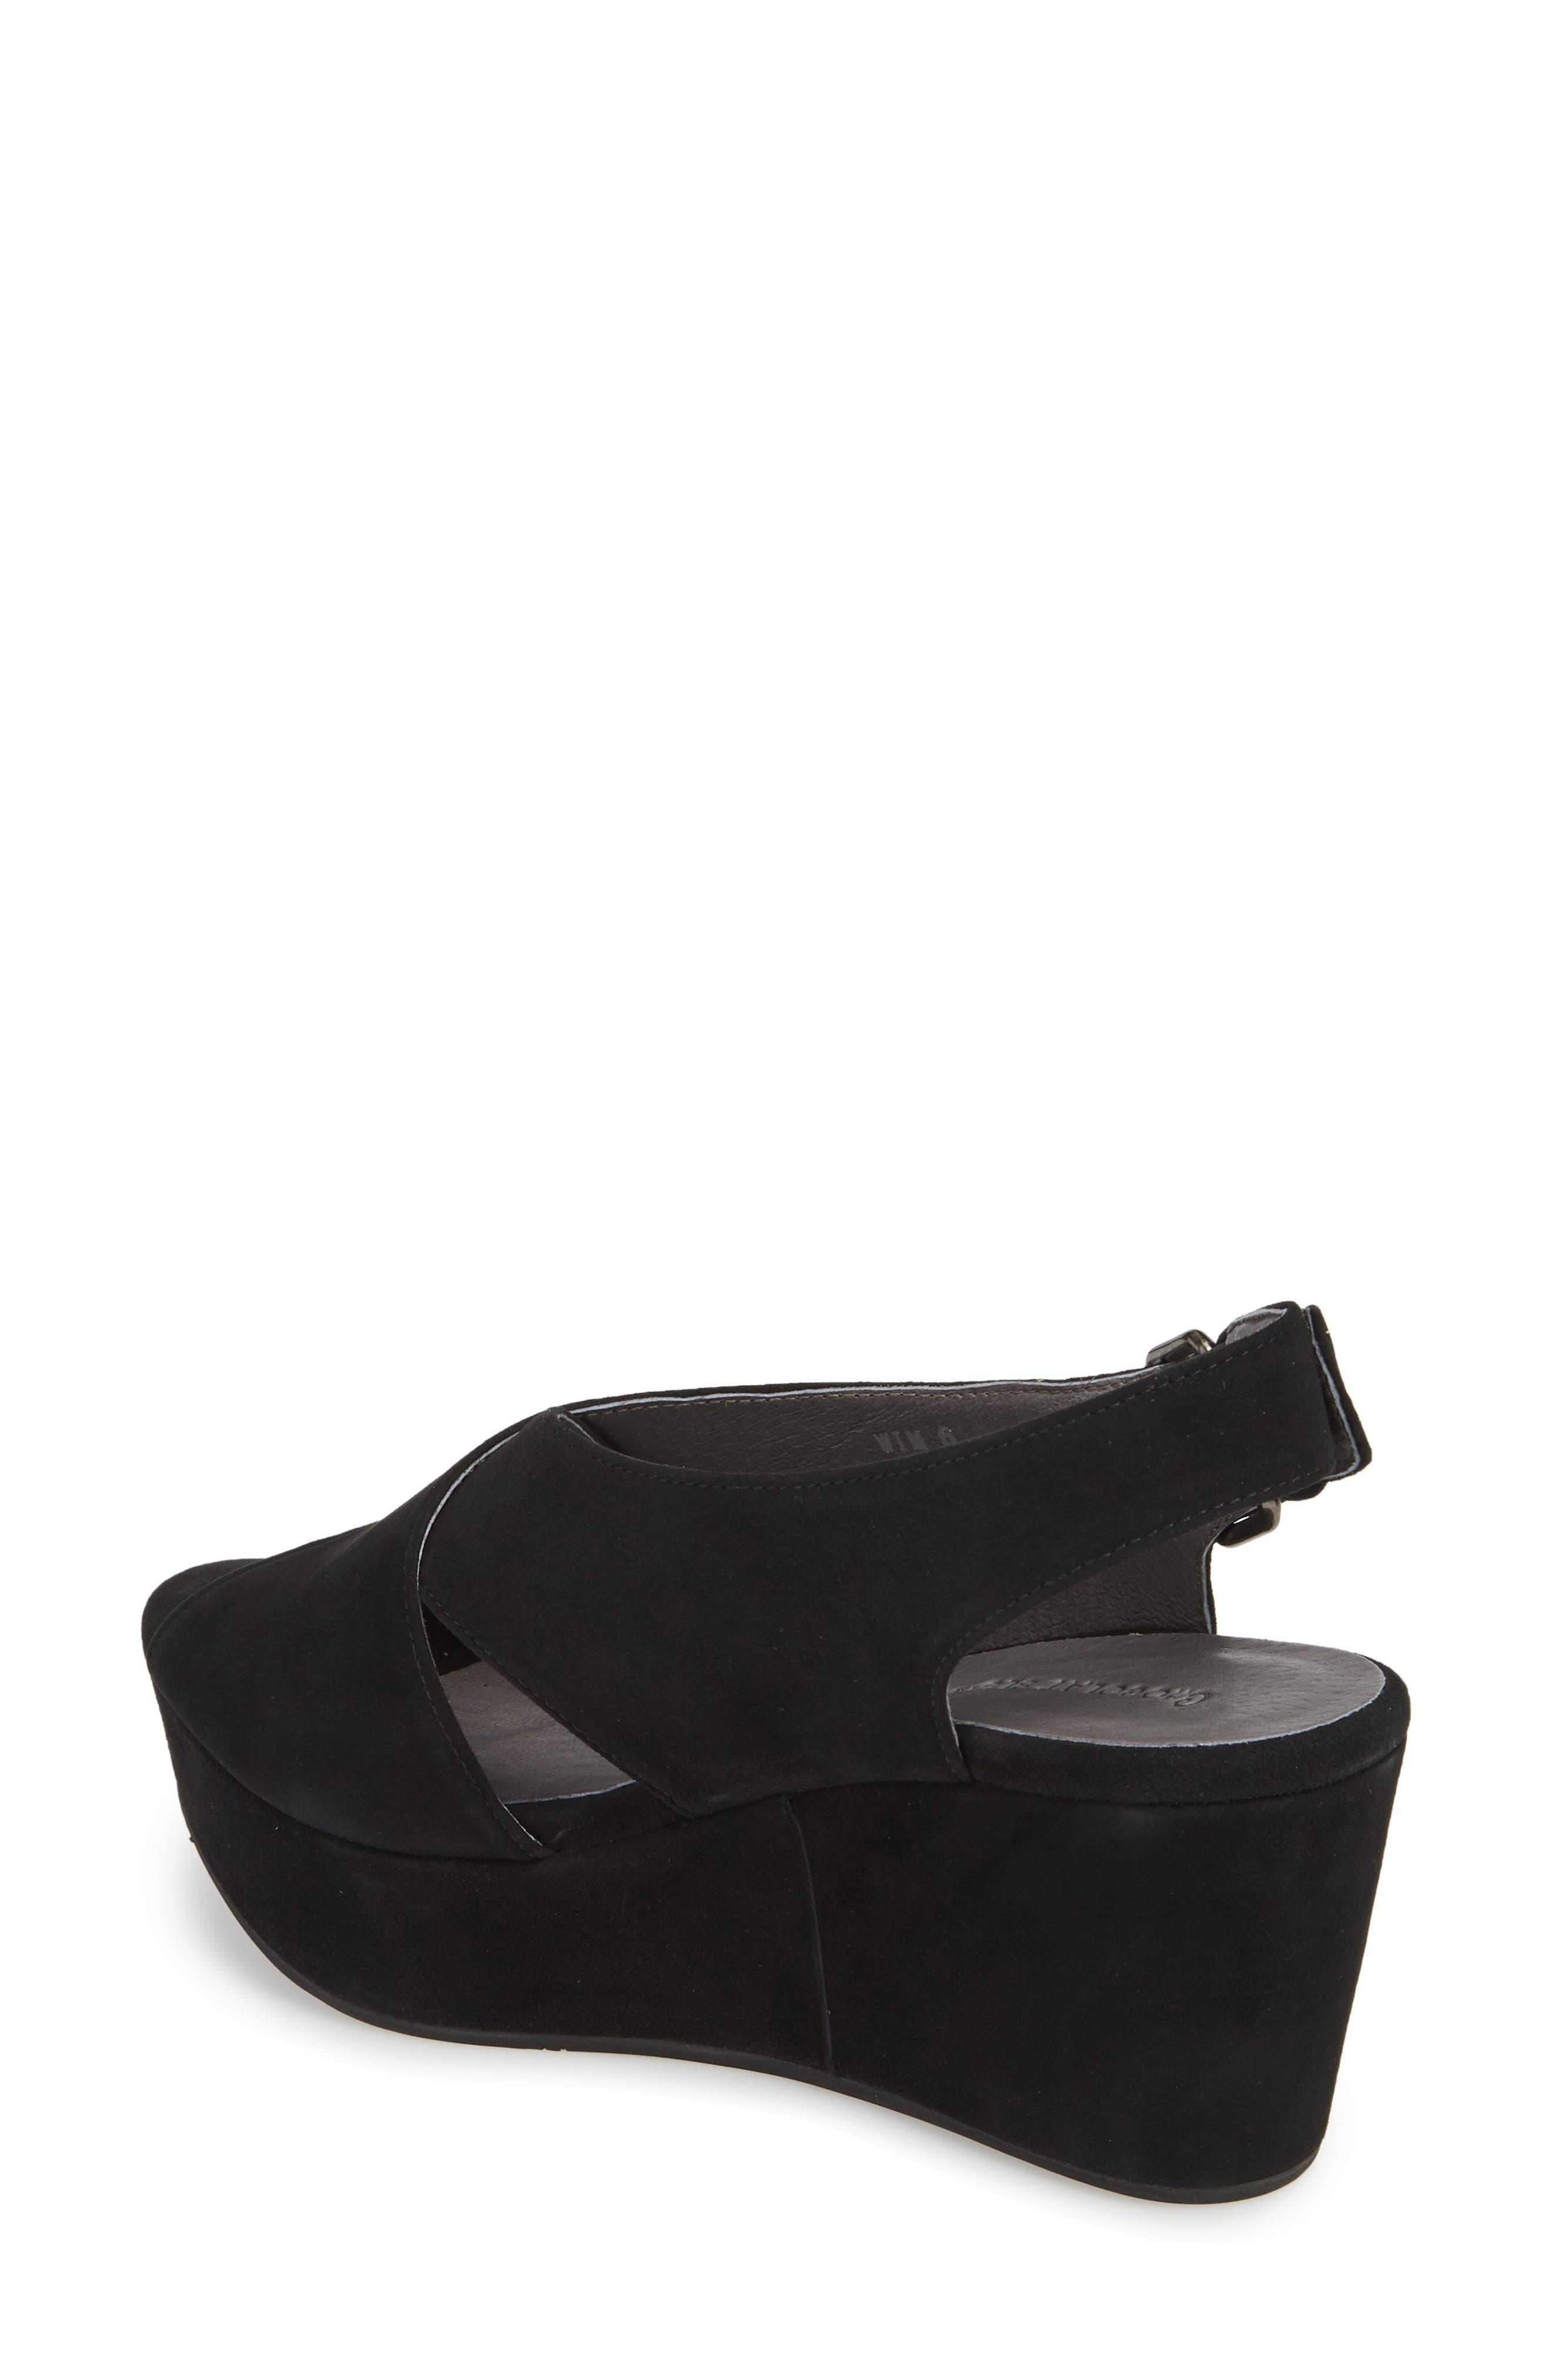 Wim Platform Wedge Sandal,                             Alternate thumbnail 2, color,                             BLACK SUEDE